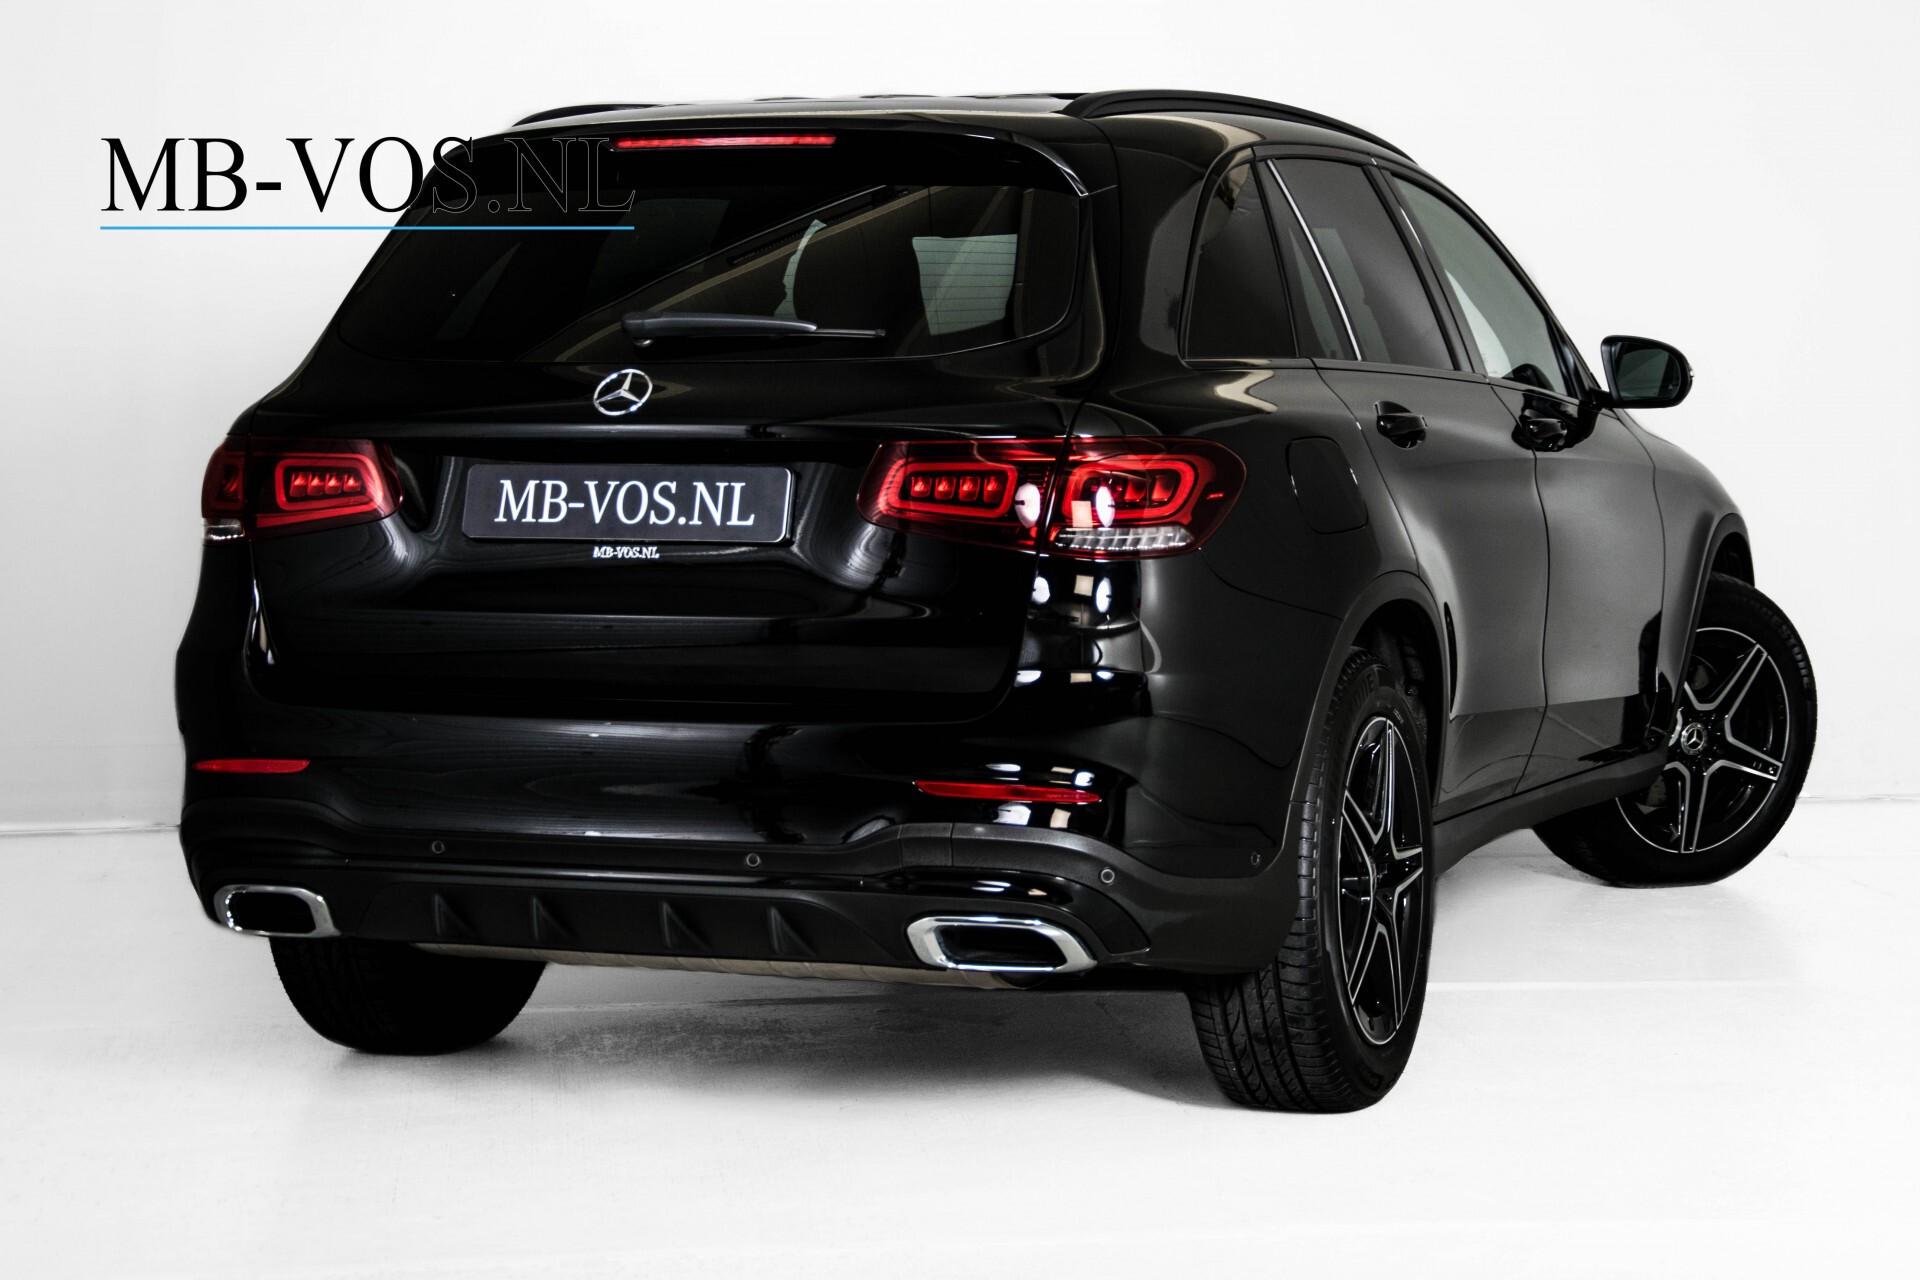 Mercedes-Benz GLC 200 4-M AMG Night/Panorama/Distronic Pro/Burmester/360camera/Exclusive Aut9 Foto 2